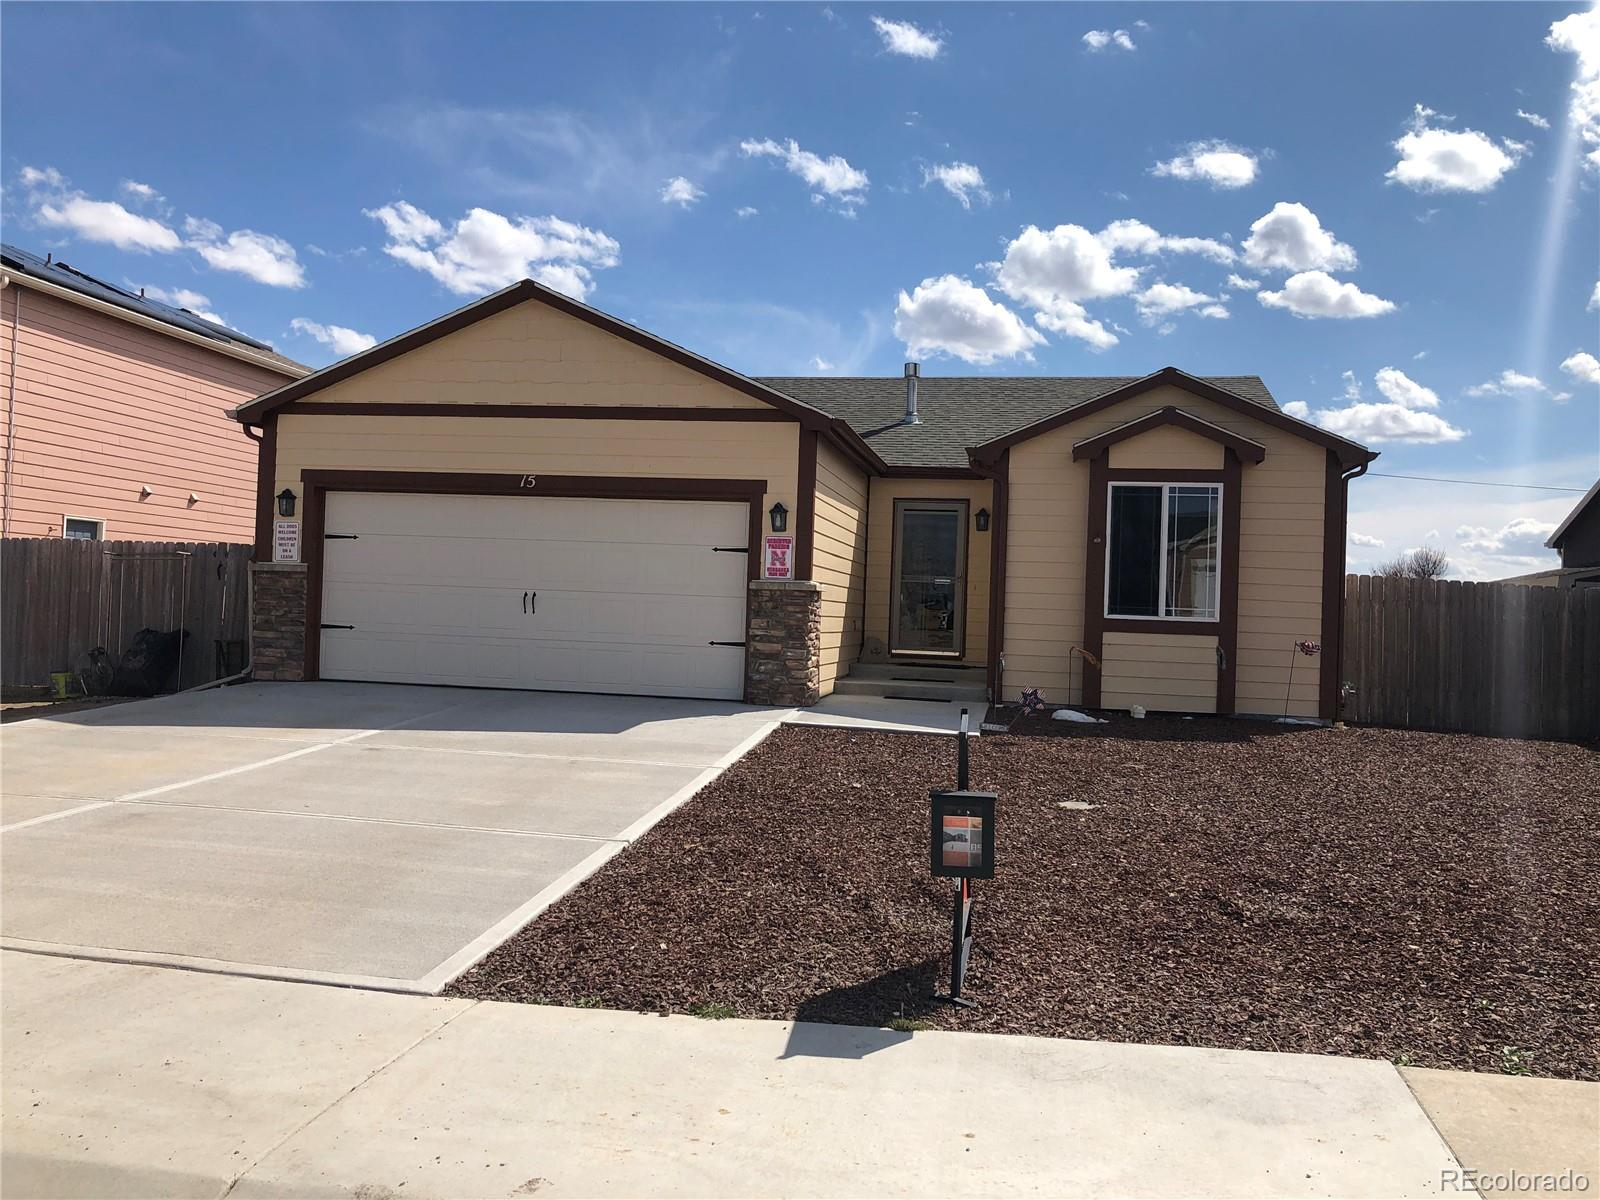 15 Johnson Circle, Keenesburg, CO 80643 - Keenesburg, CO real estate listing